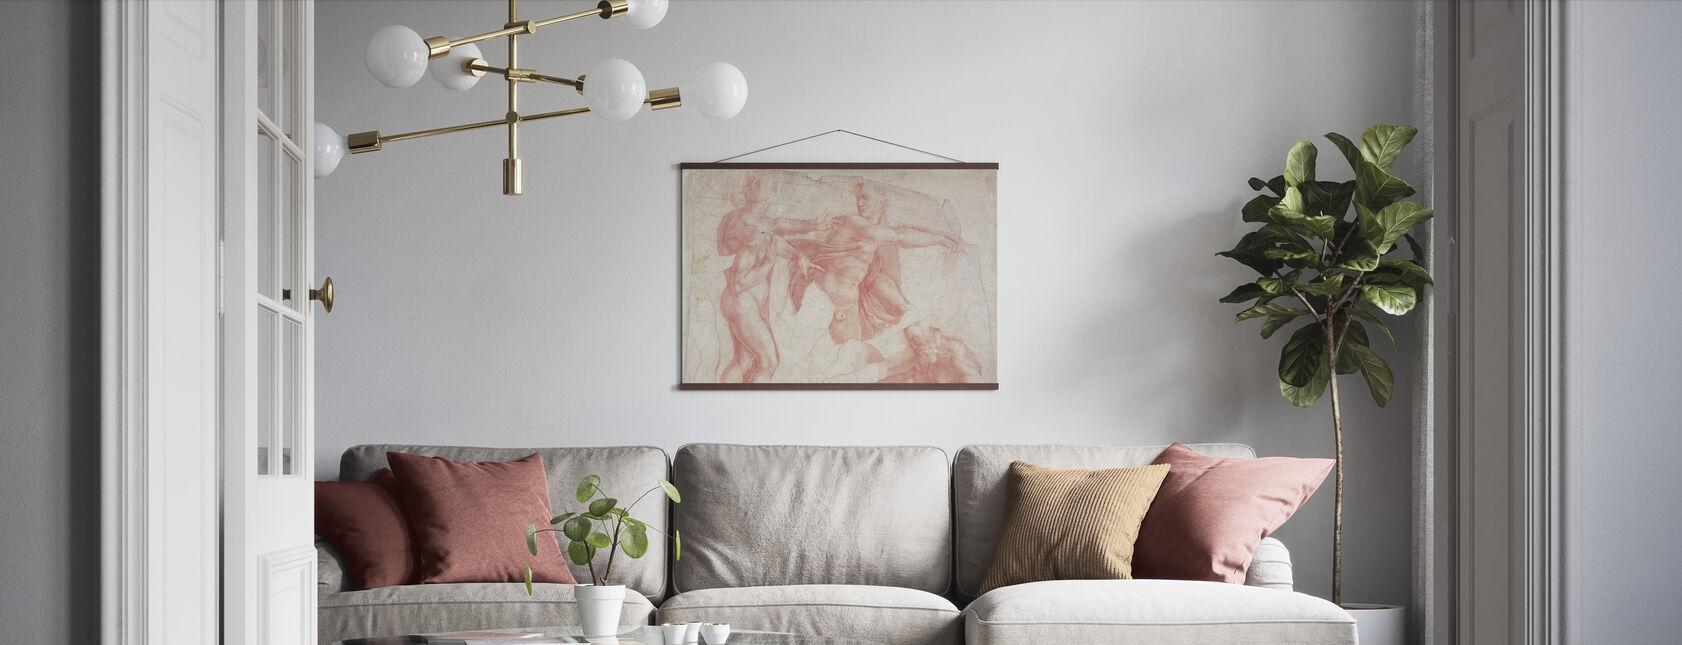 Studies of Male Nudes - Michelangelo Buonarroti - Poster - Living Room